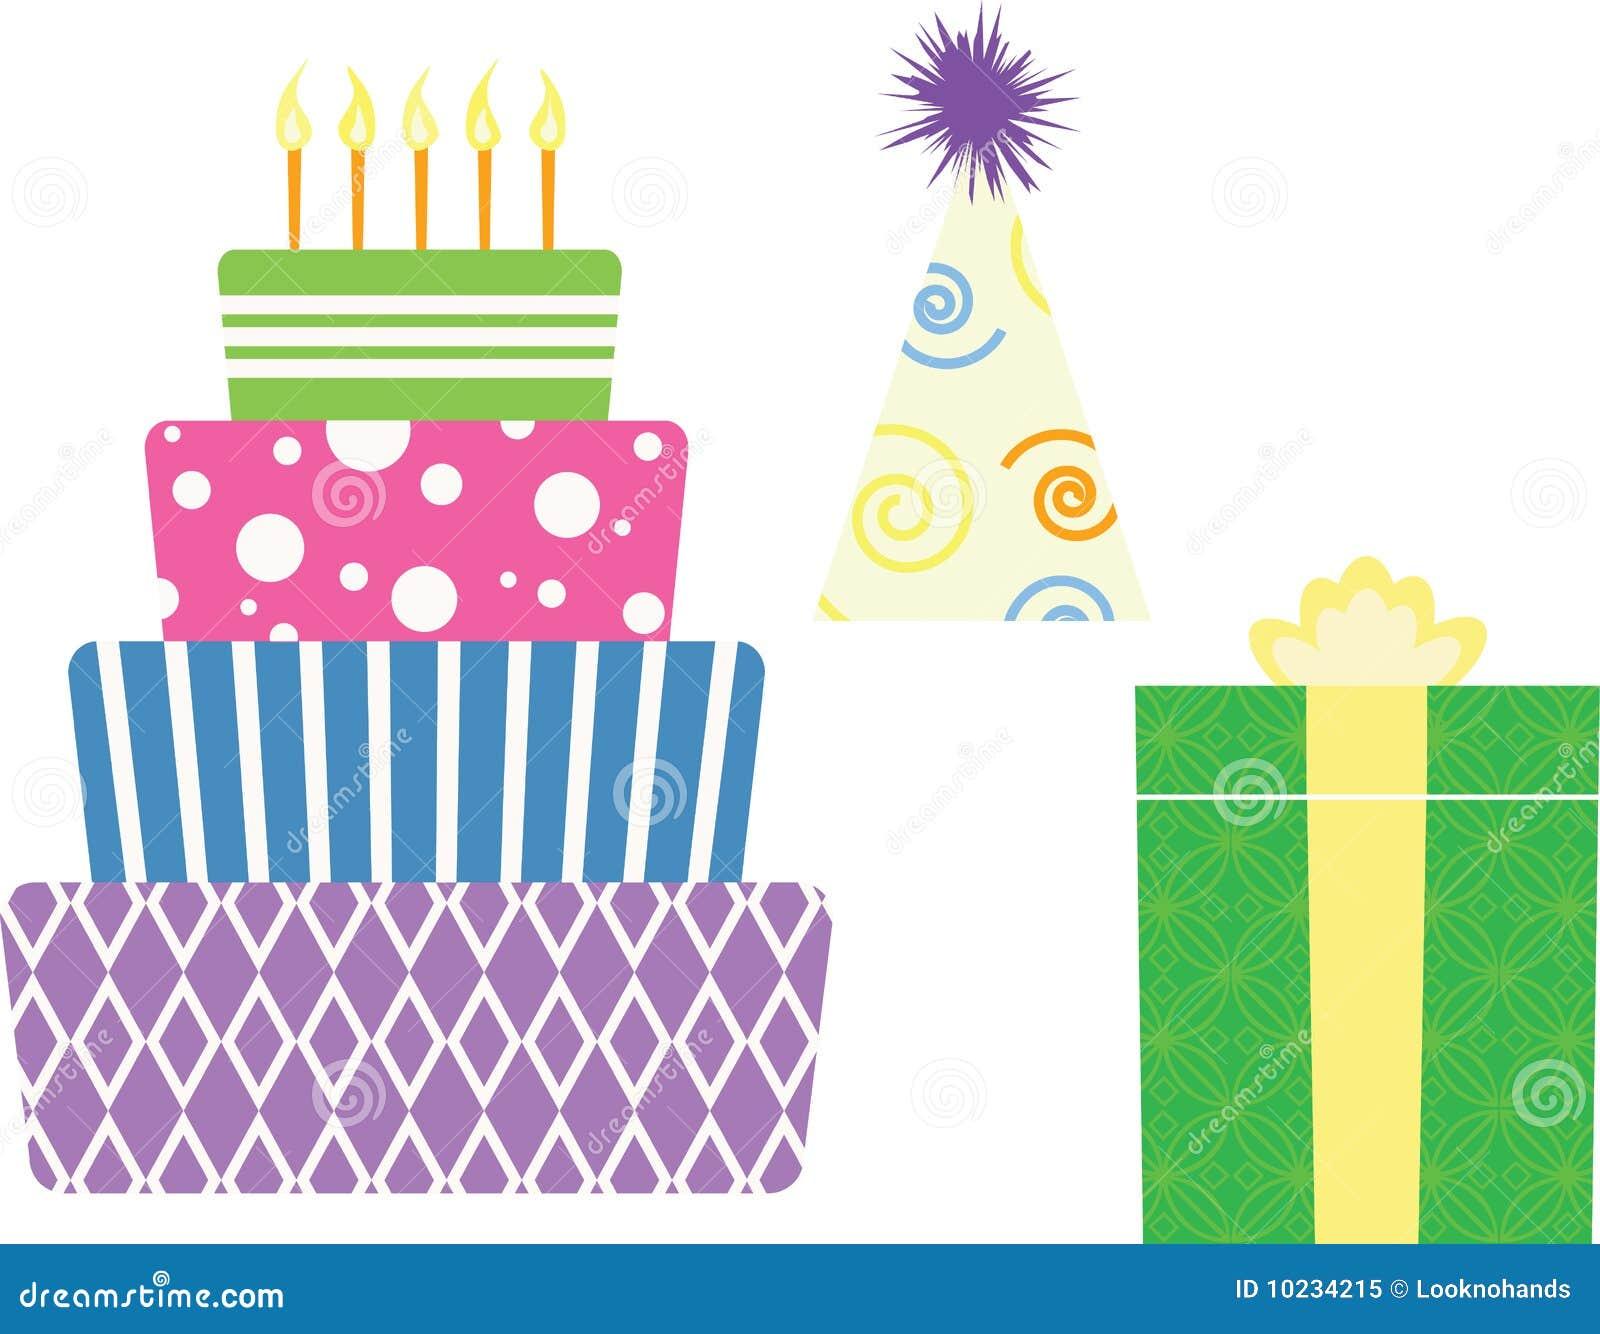 Birthday Symbols Royalty Free Stock Photo